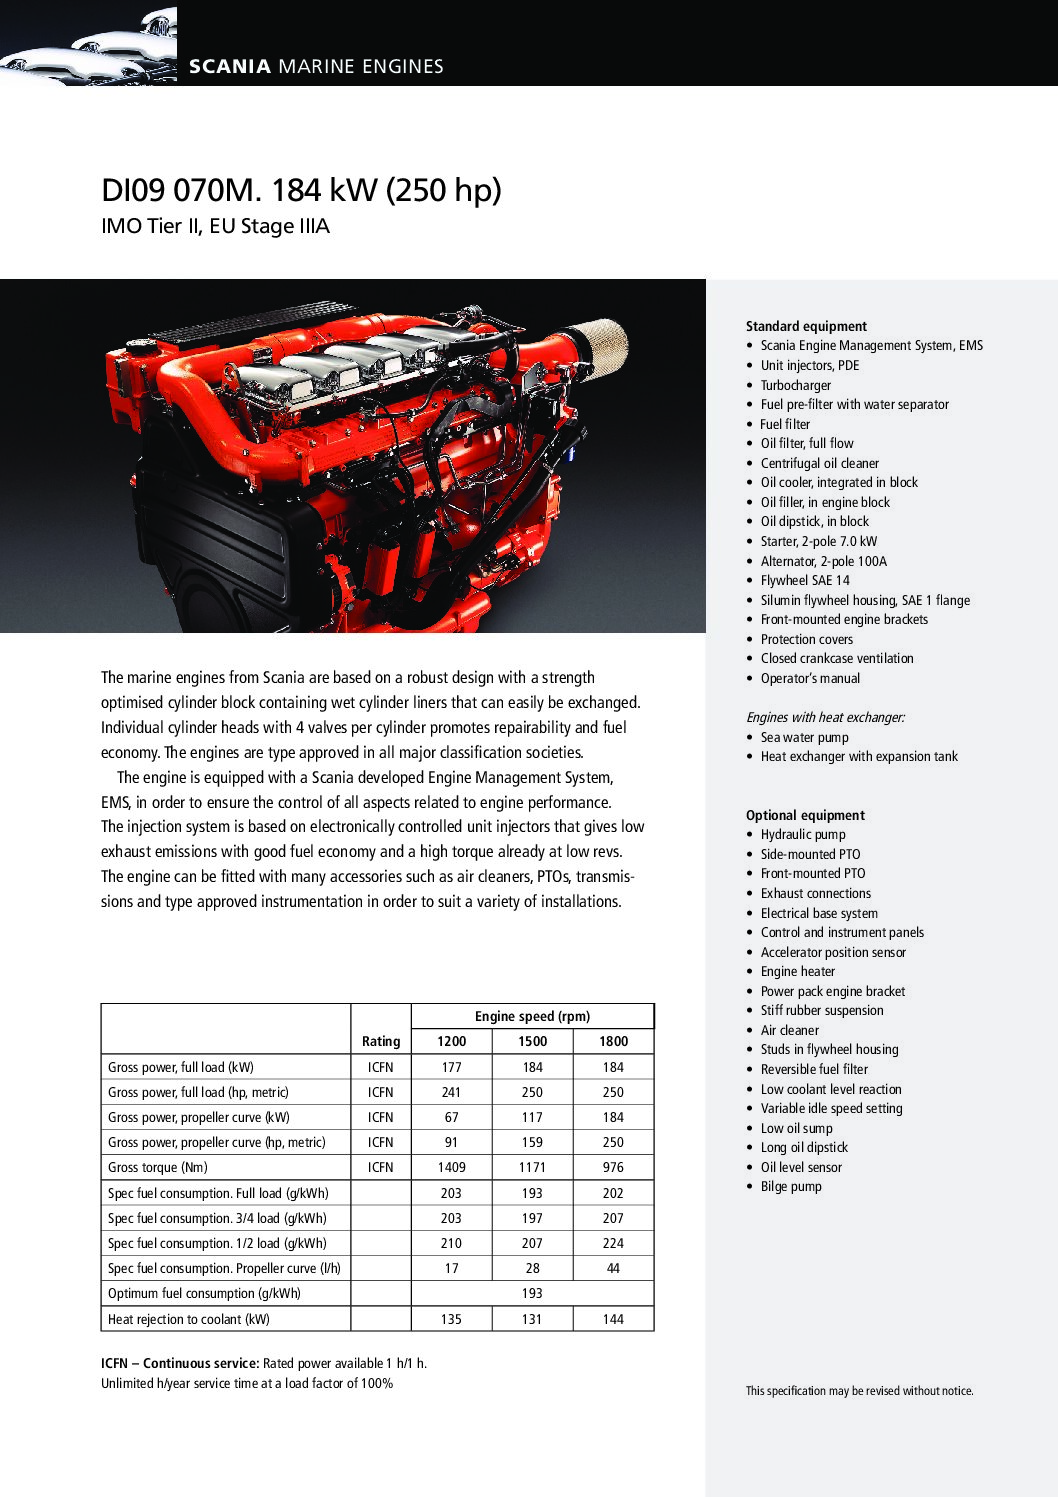 Scania datablad